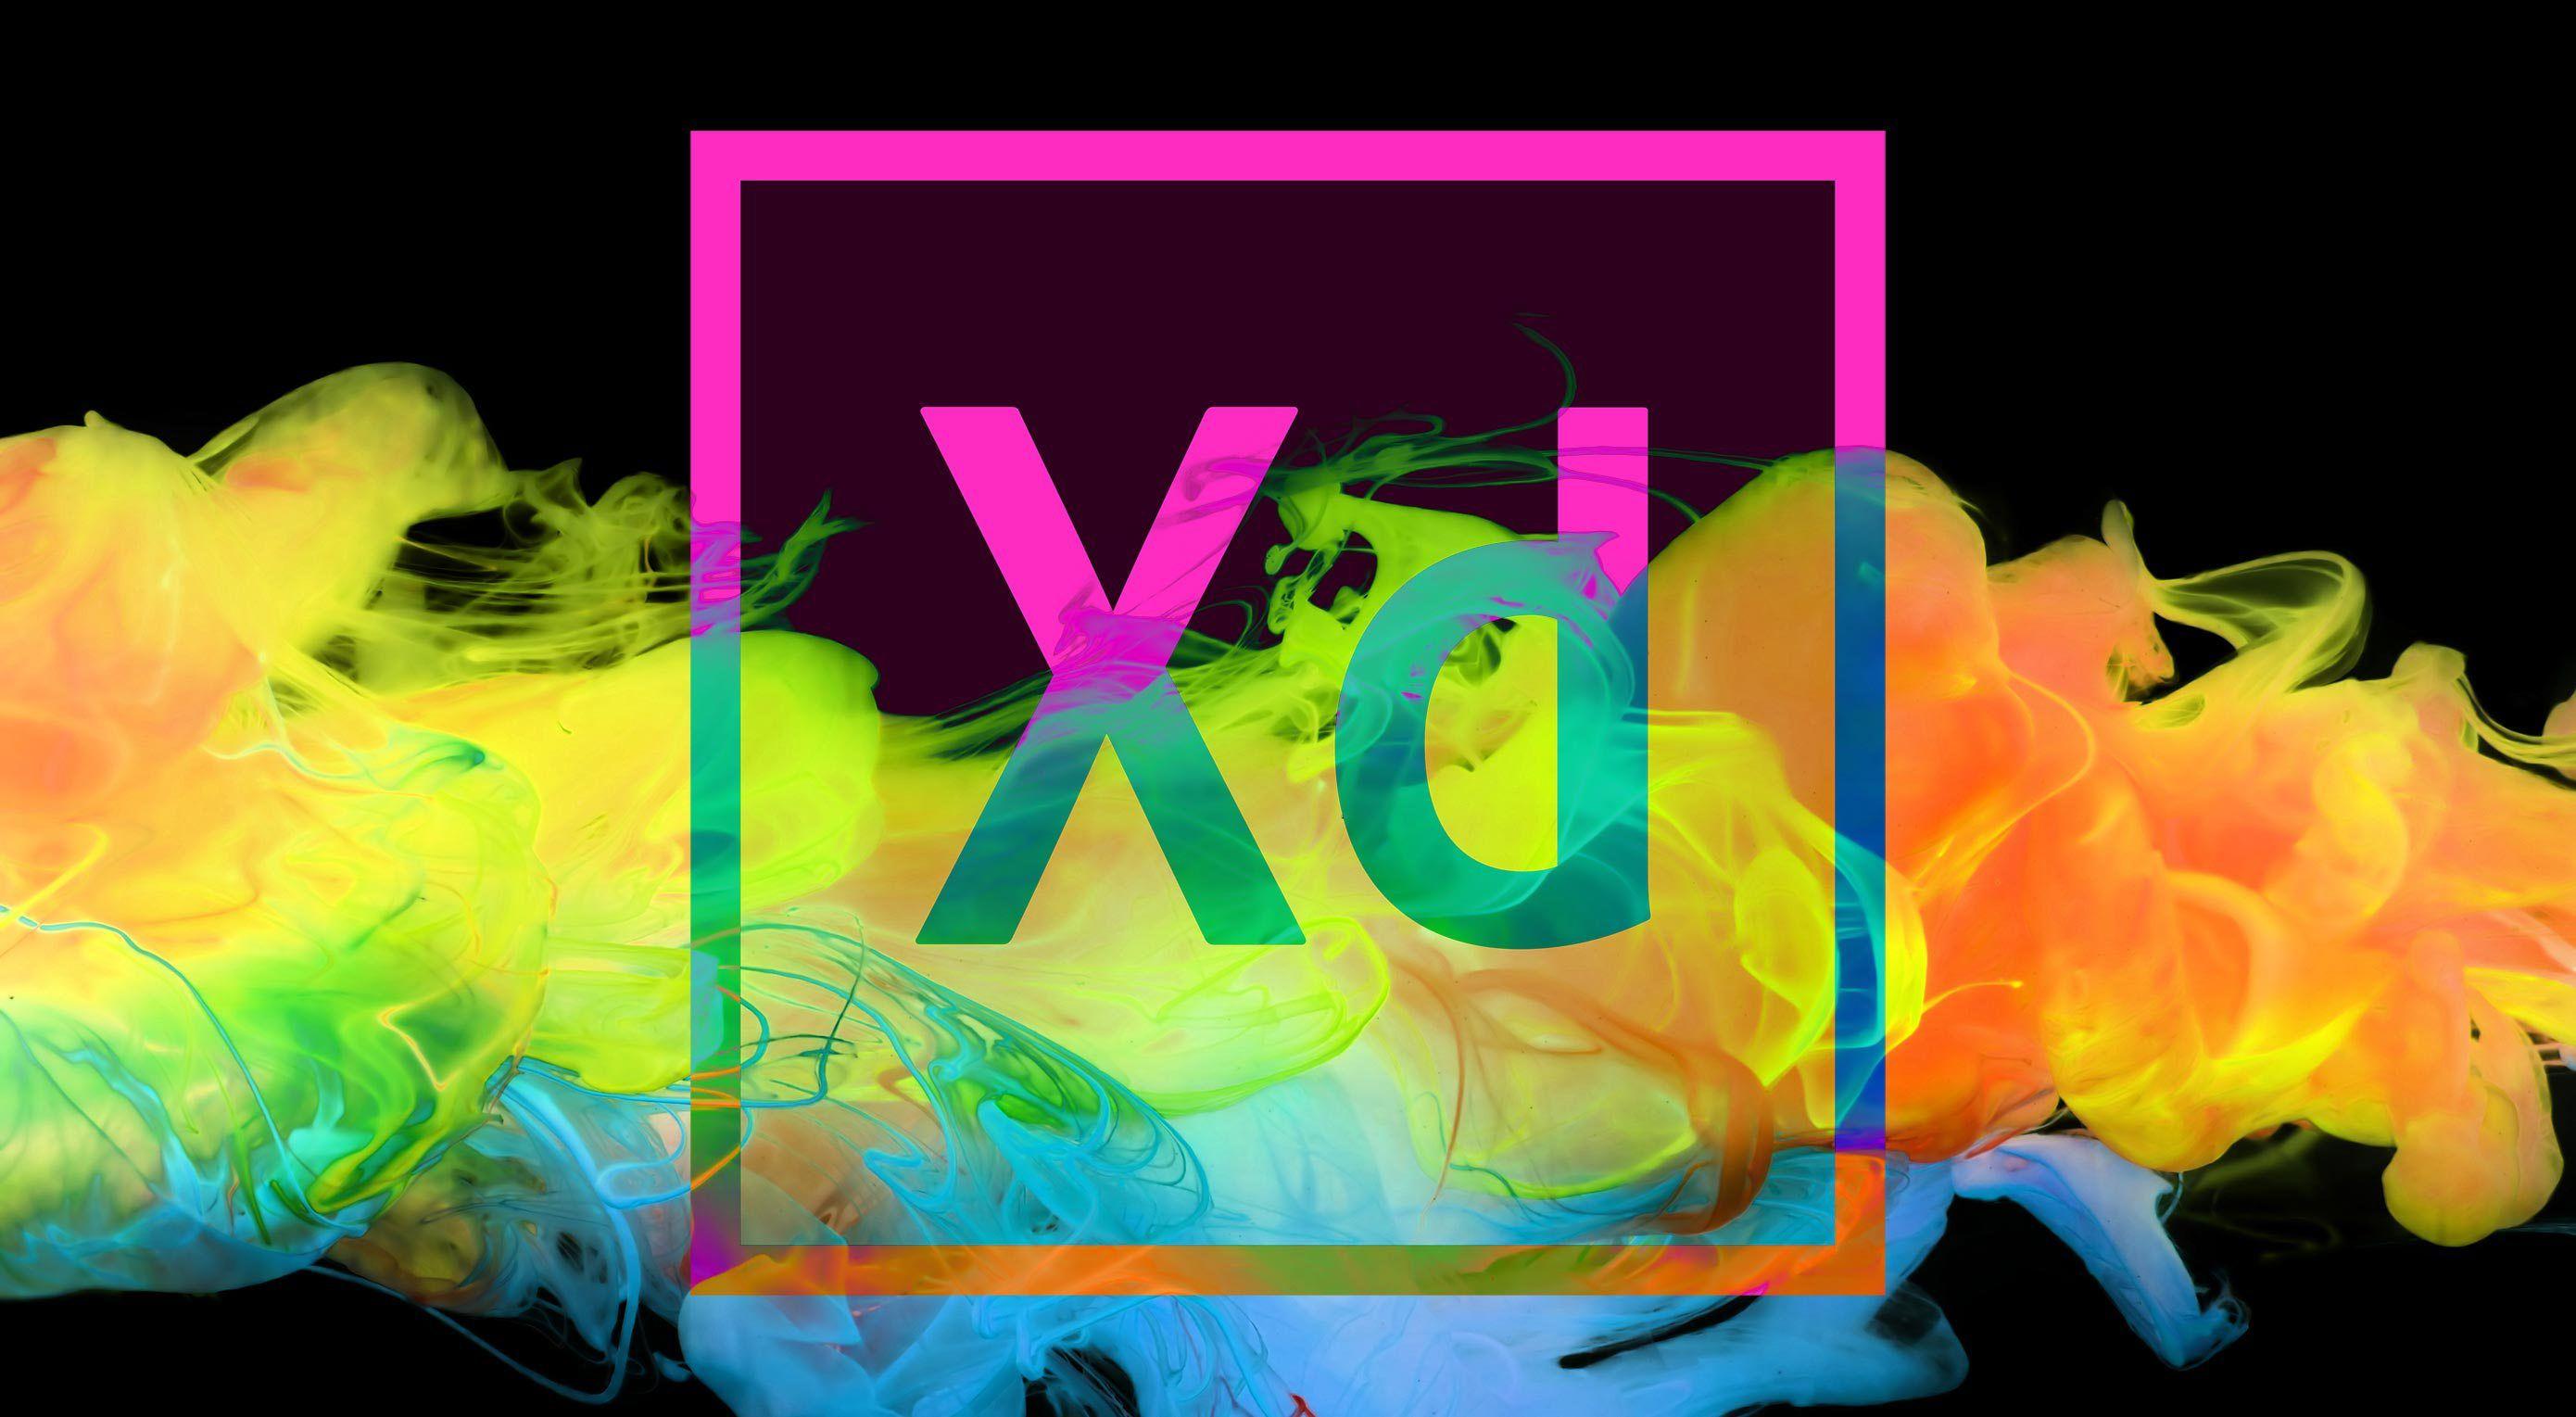 Adobe Xd Cc 2019 Free Download Windows Adobe Xd Web Design